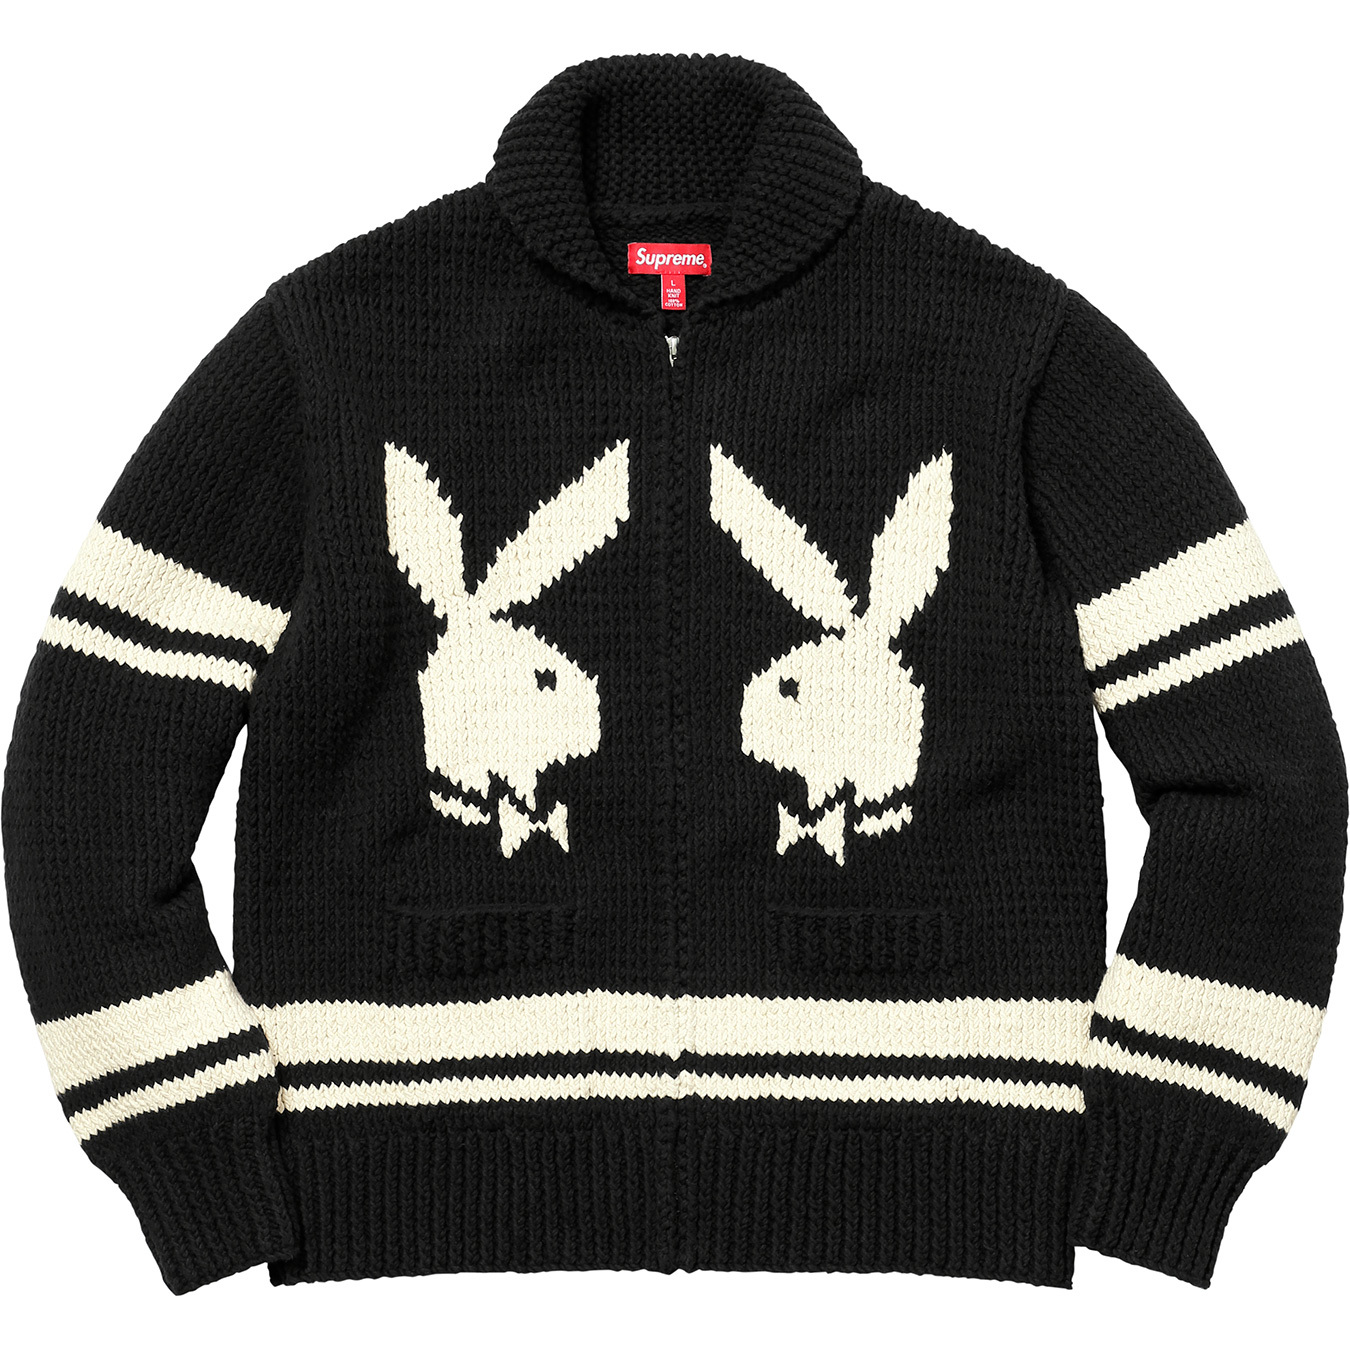 Supreme Playboy Shawl Collar Full Zip Sweater Black